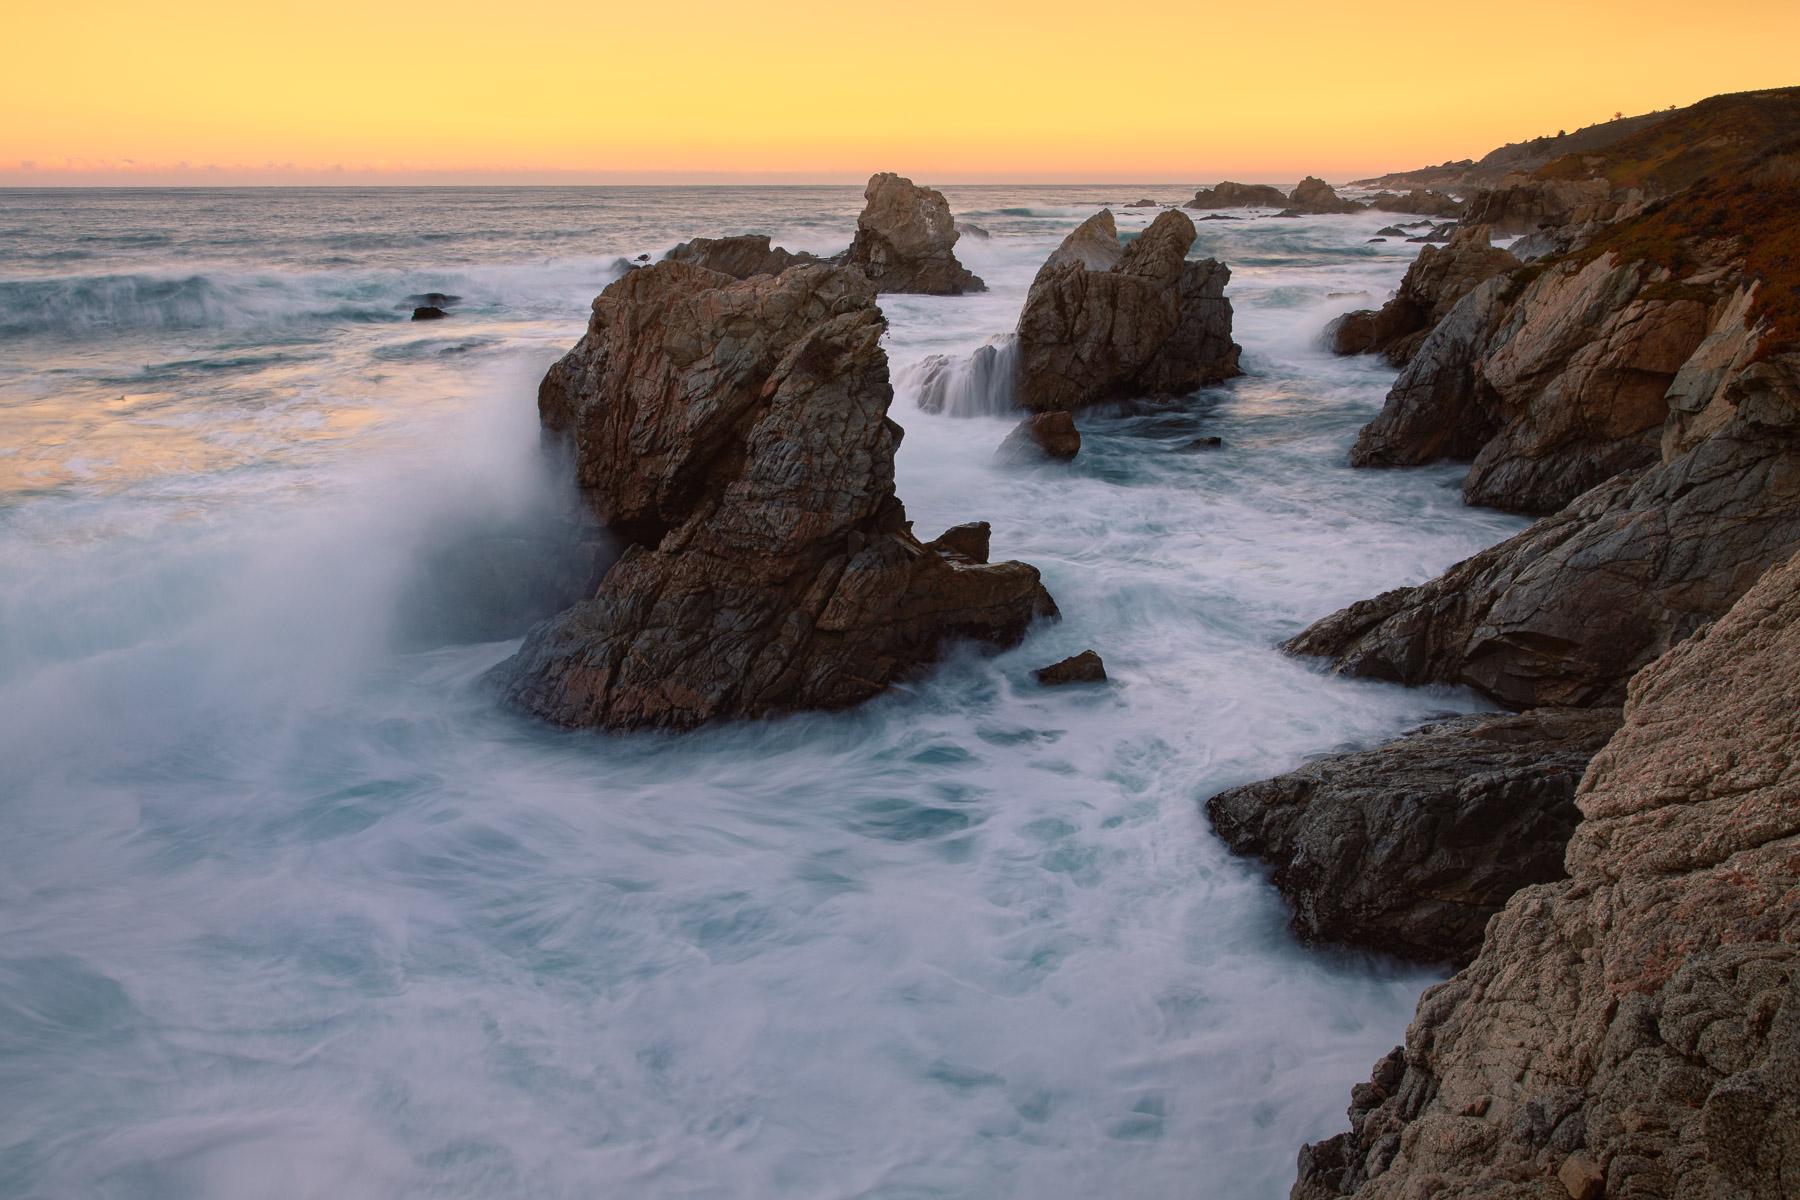 Serastacks and breaking waves along California's rugged Big Sur Coastline. Limited Edition: 100 - Artist Proof: 5